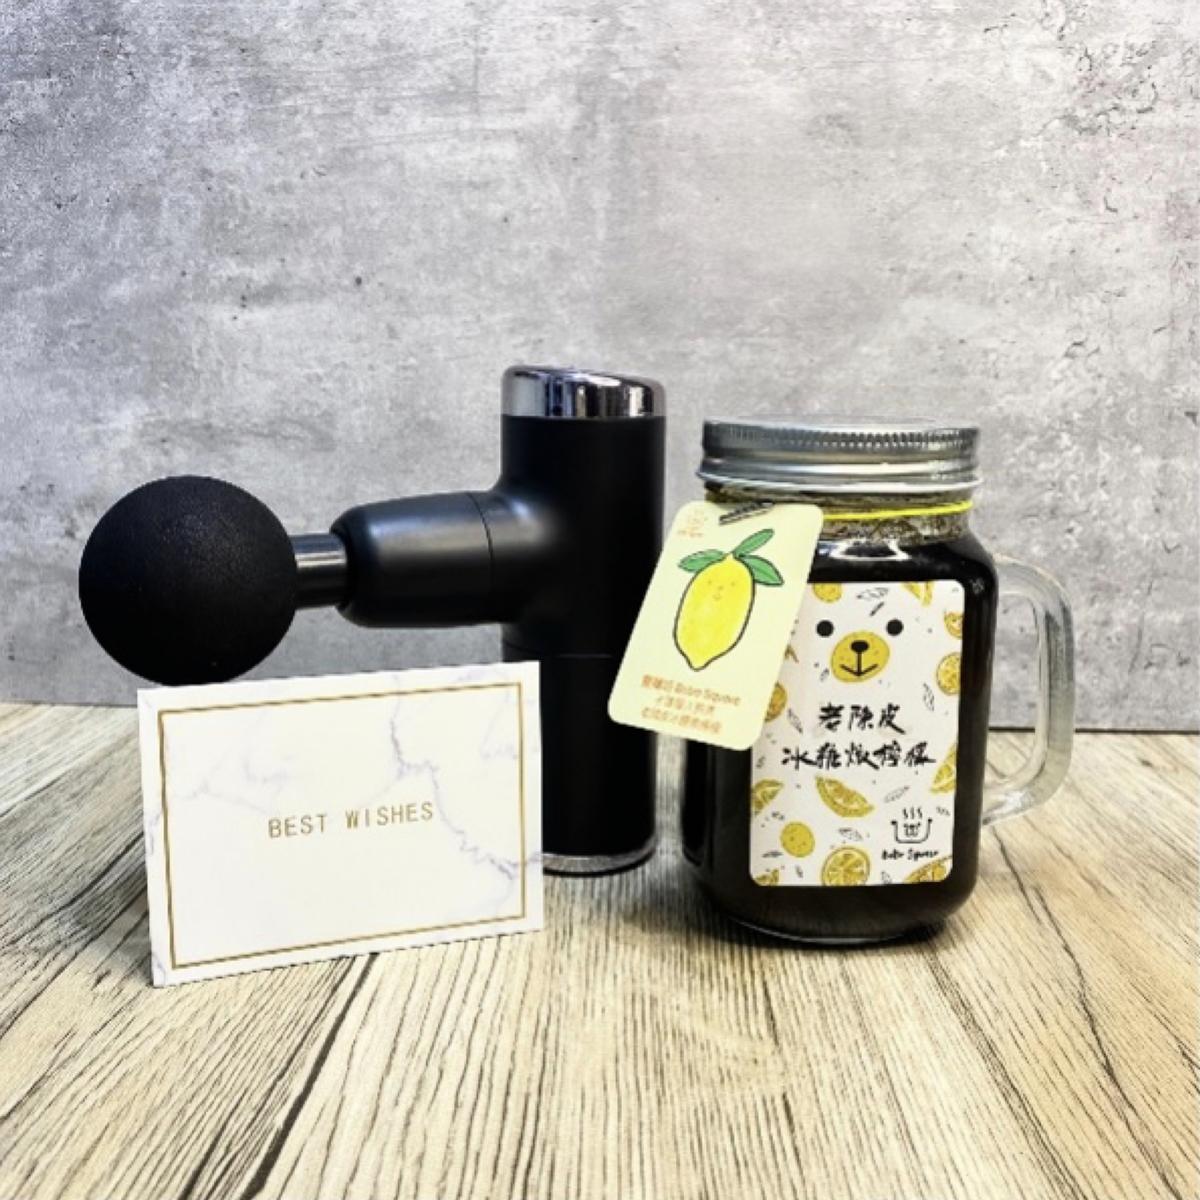 Bobo Square:老陳皮冰糖燉檸檬 + 輕巧便攜按摩槍 $368(原價: $ 446)。